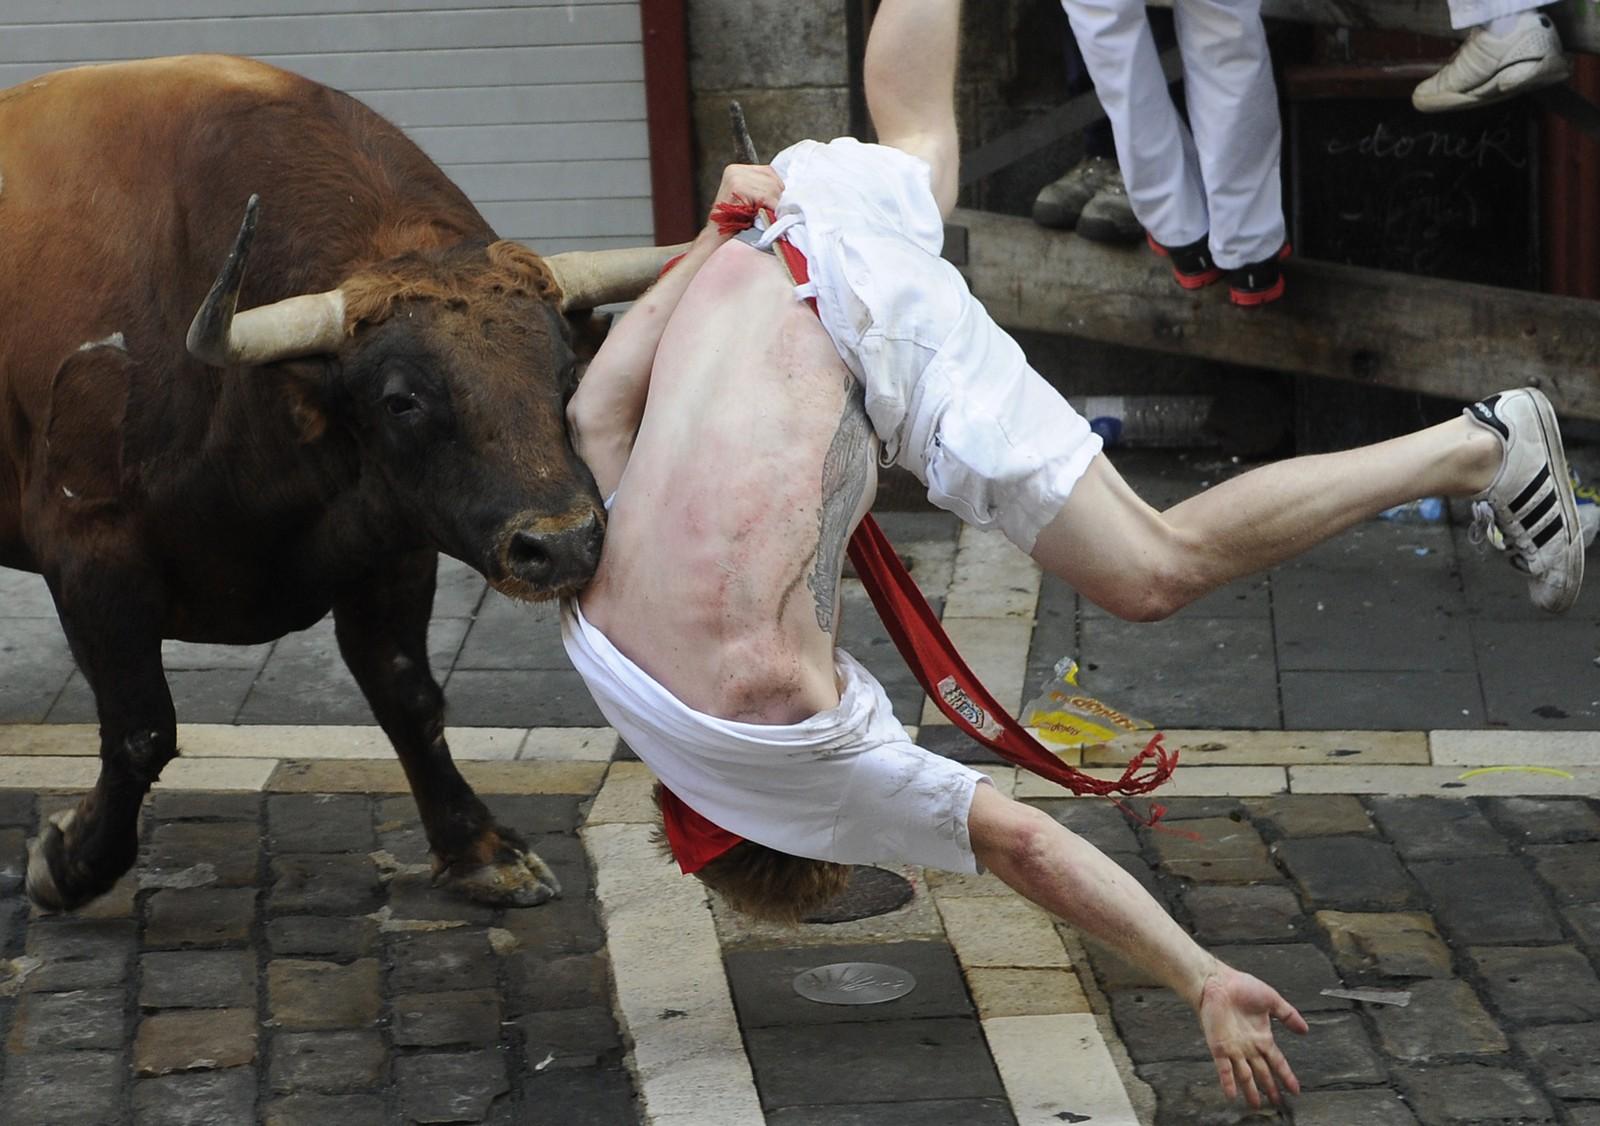 Brutale scener i okseløpet under San Fermin-festivalen i Pamplona, Spania 7. juli.